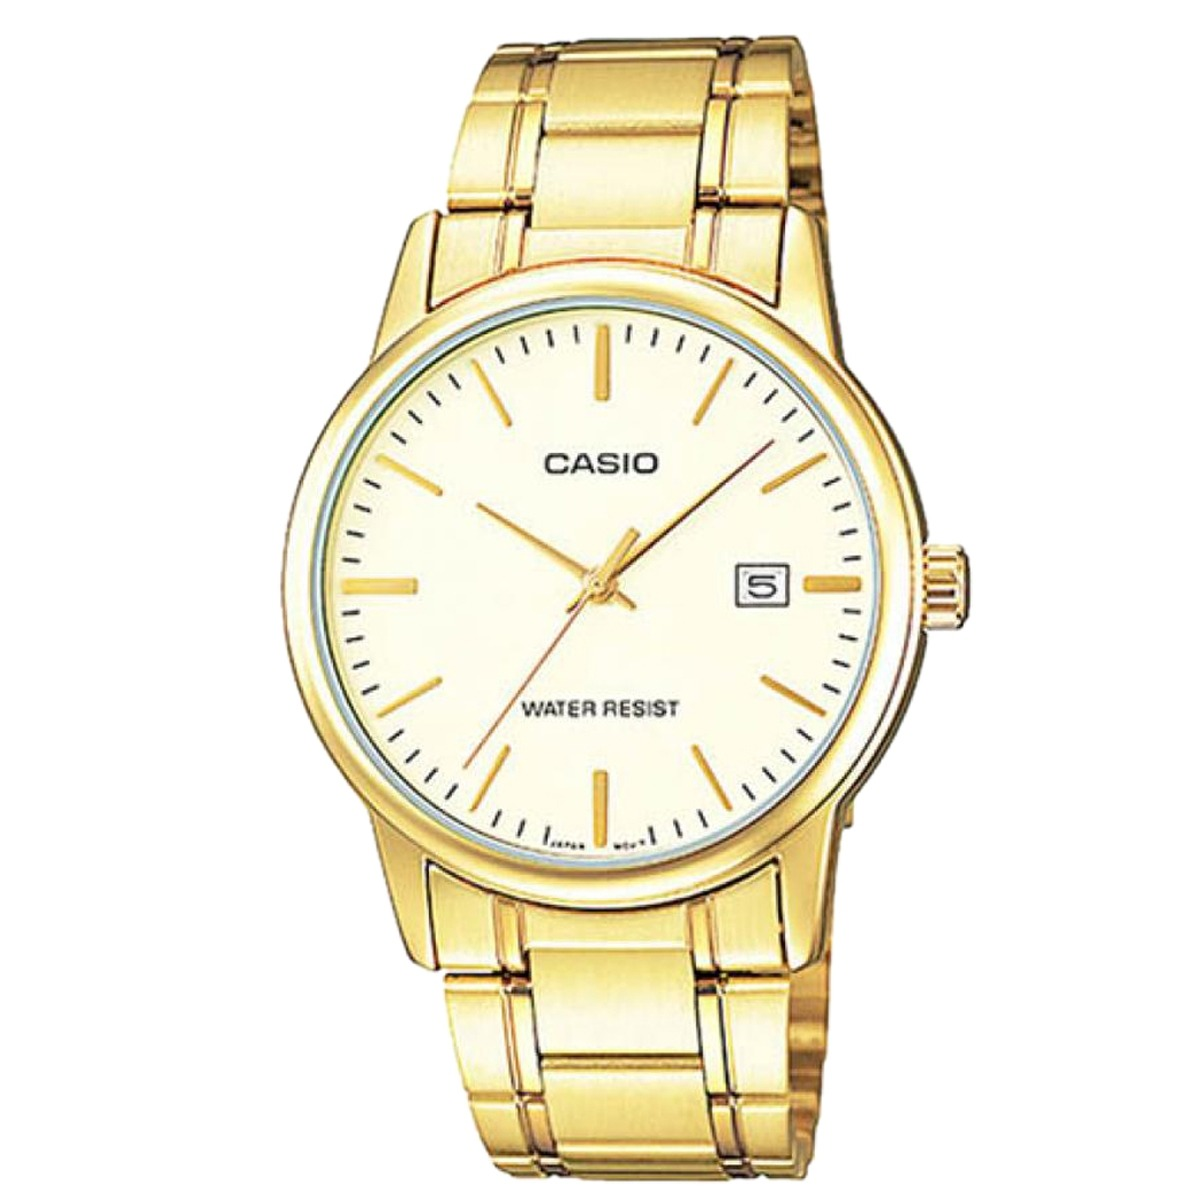 f47ab92c289 Relógio Casio Collection Analógico Unissex Mtp-v002g-9audf - R  189 ...